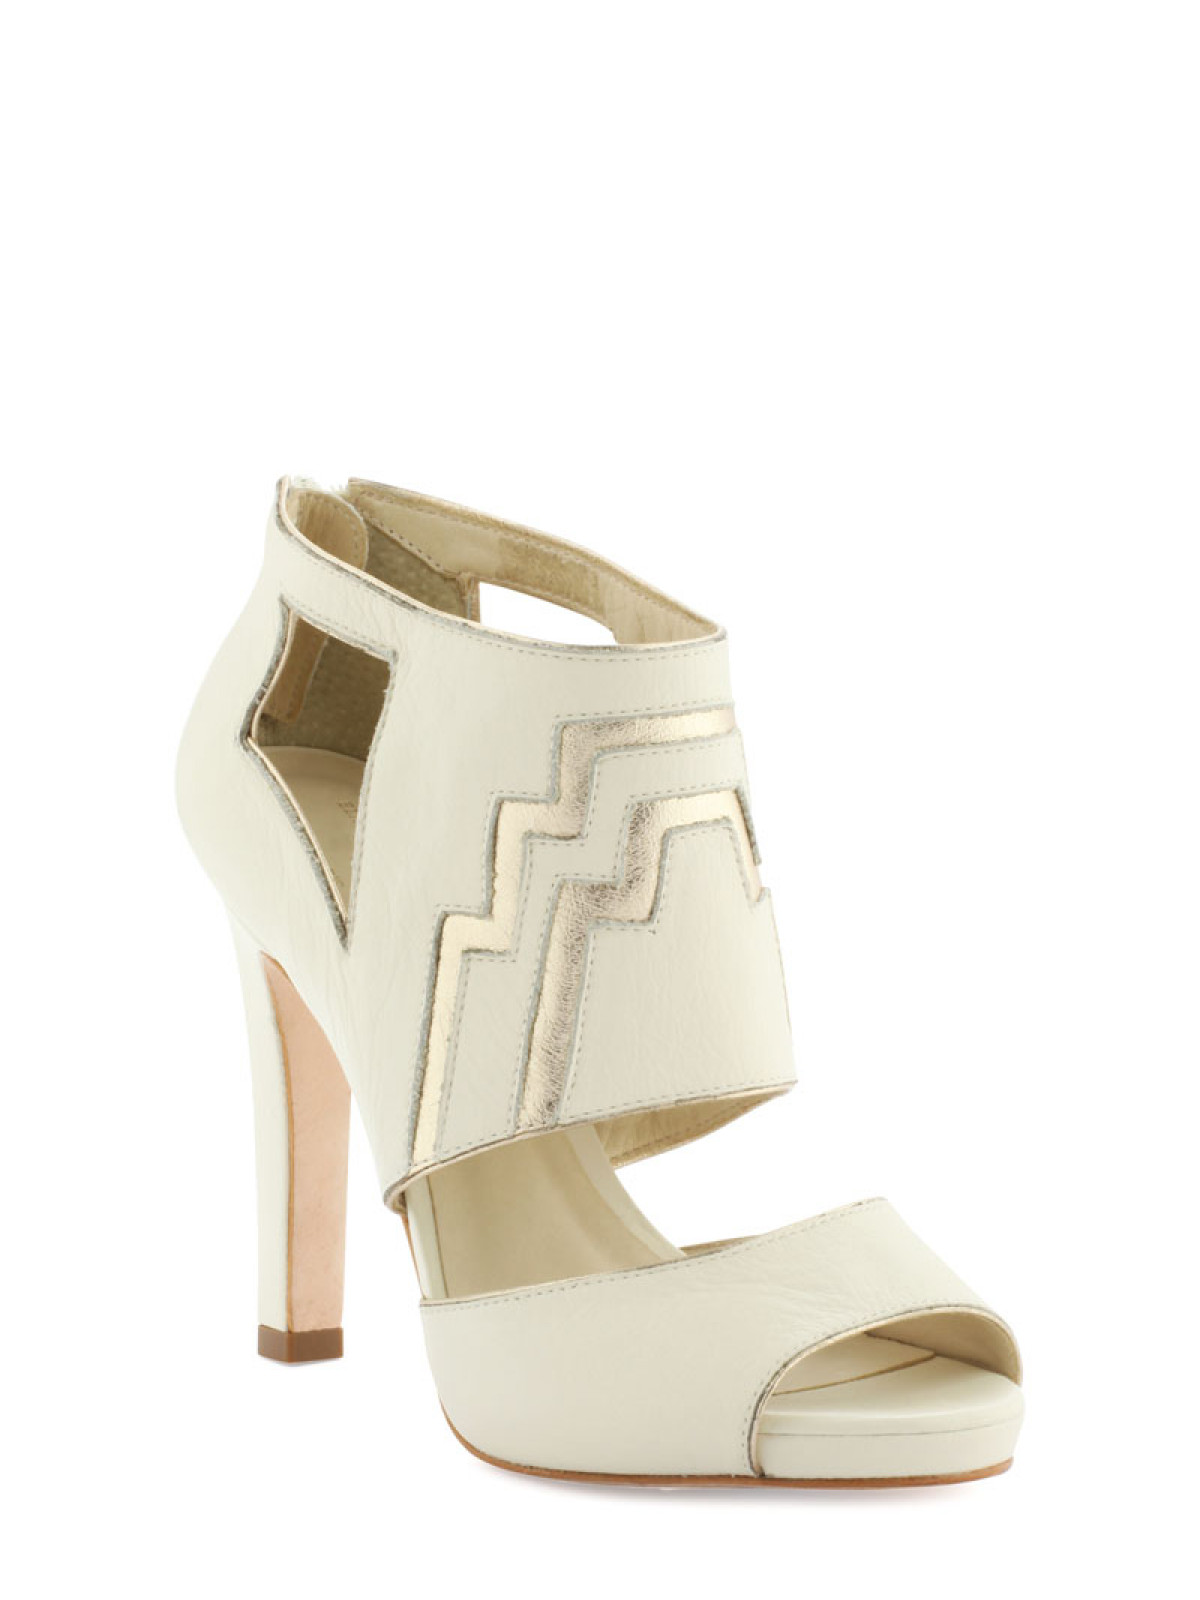 3. Escarpins-ouverts-creme-fashion-chaussures-mariee